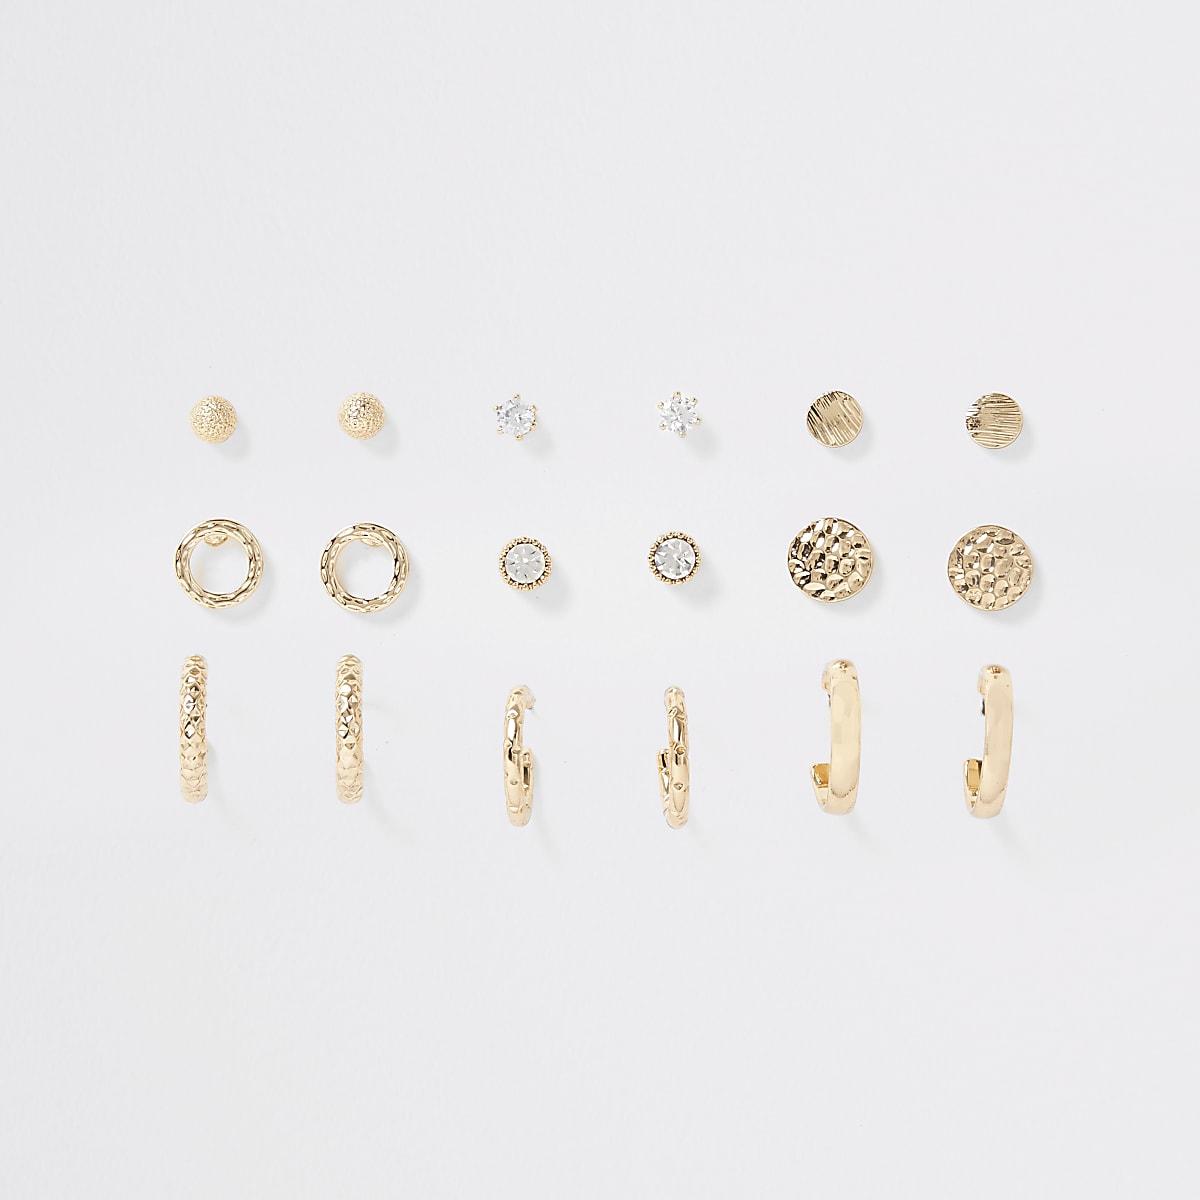 Multipack goudkleurige oorknopjes en oorringen met diamantjes